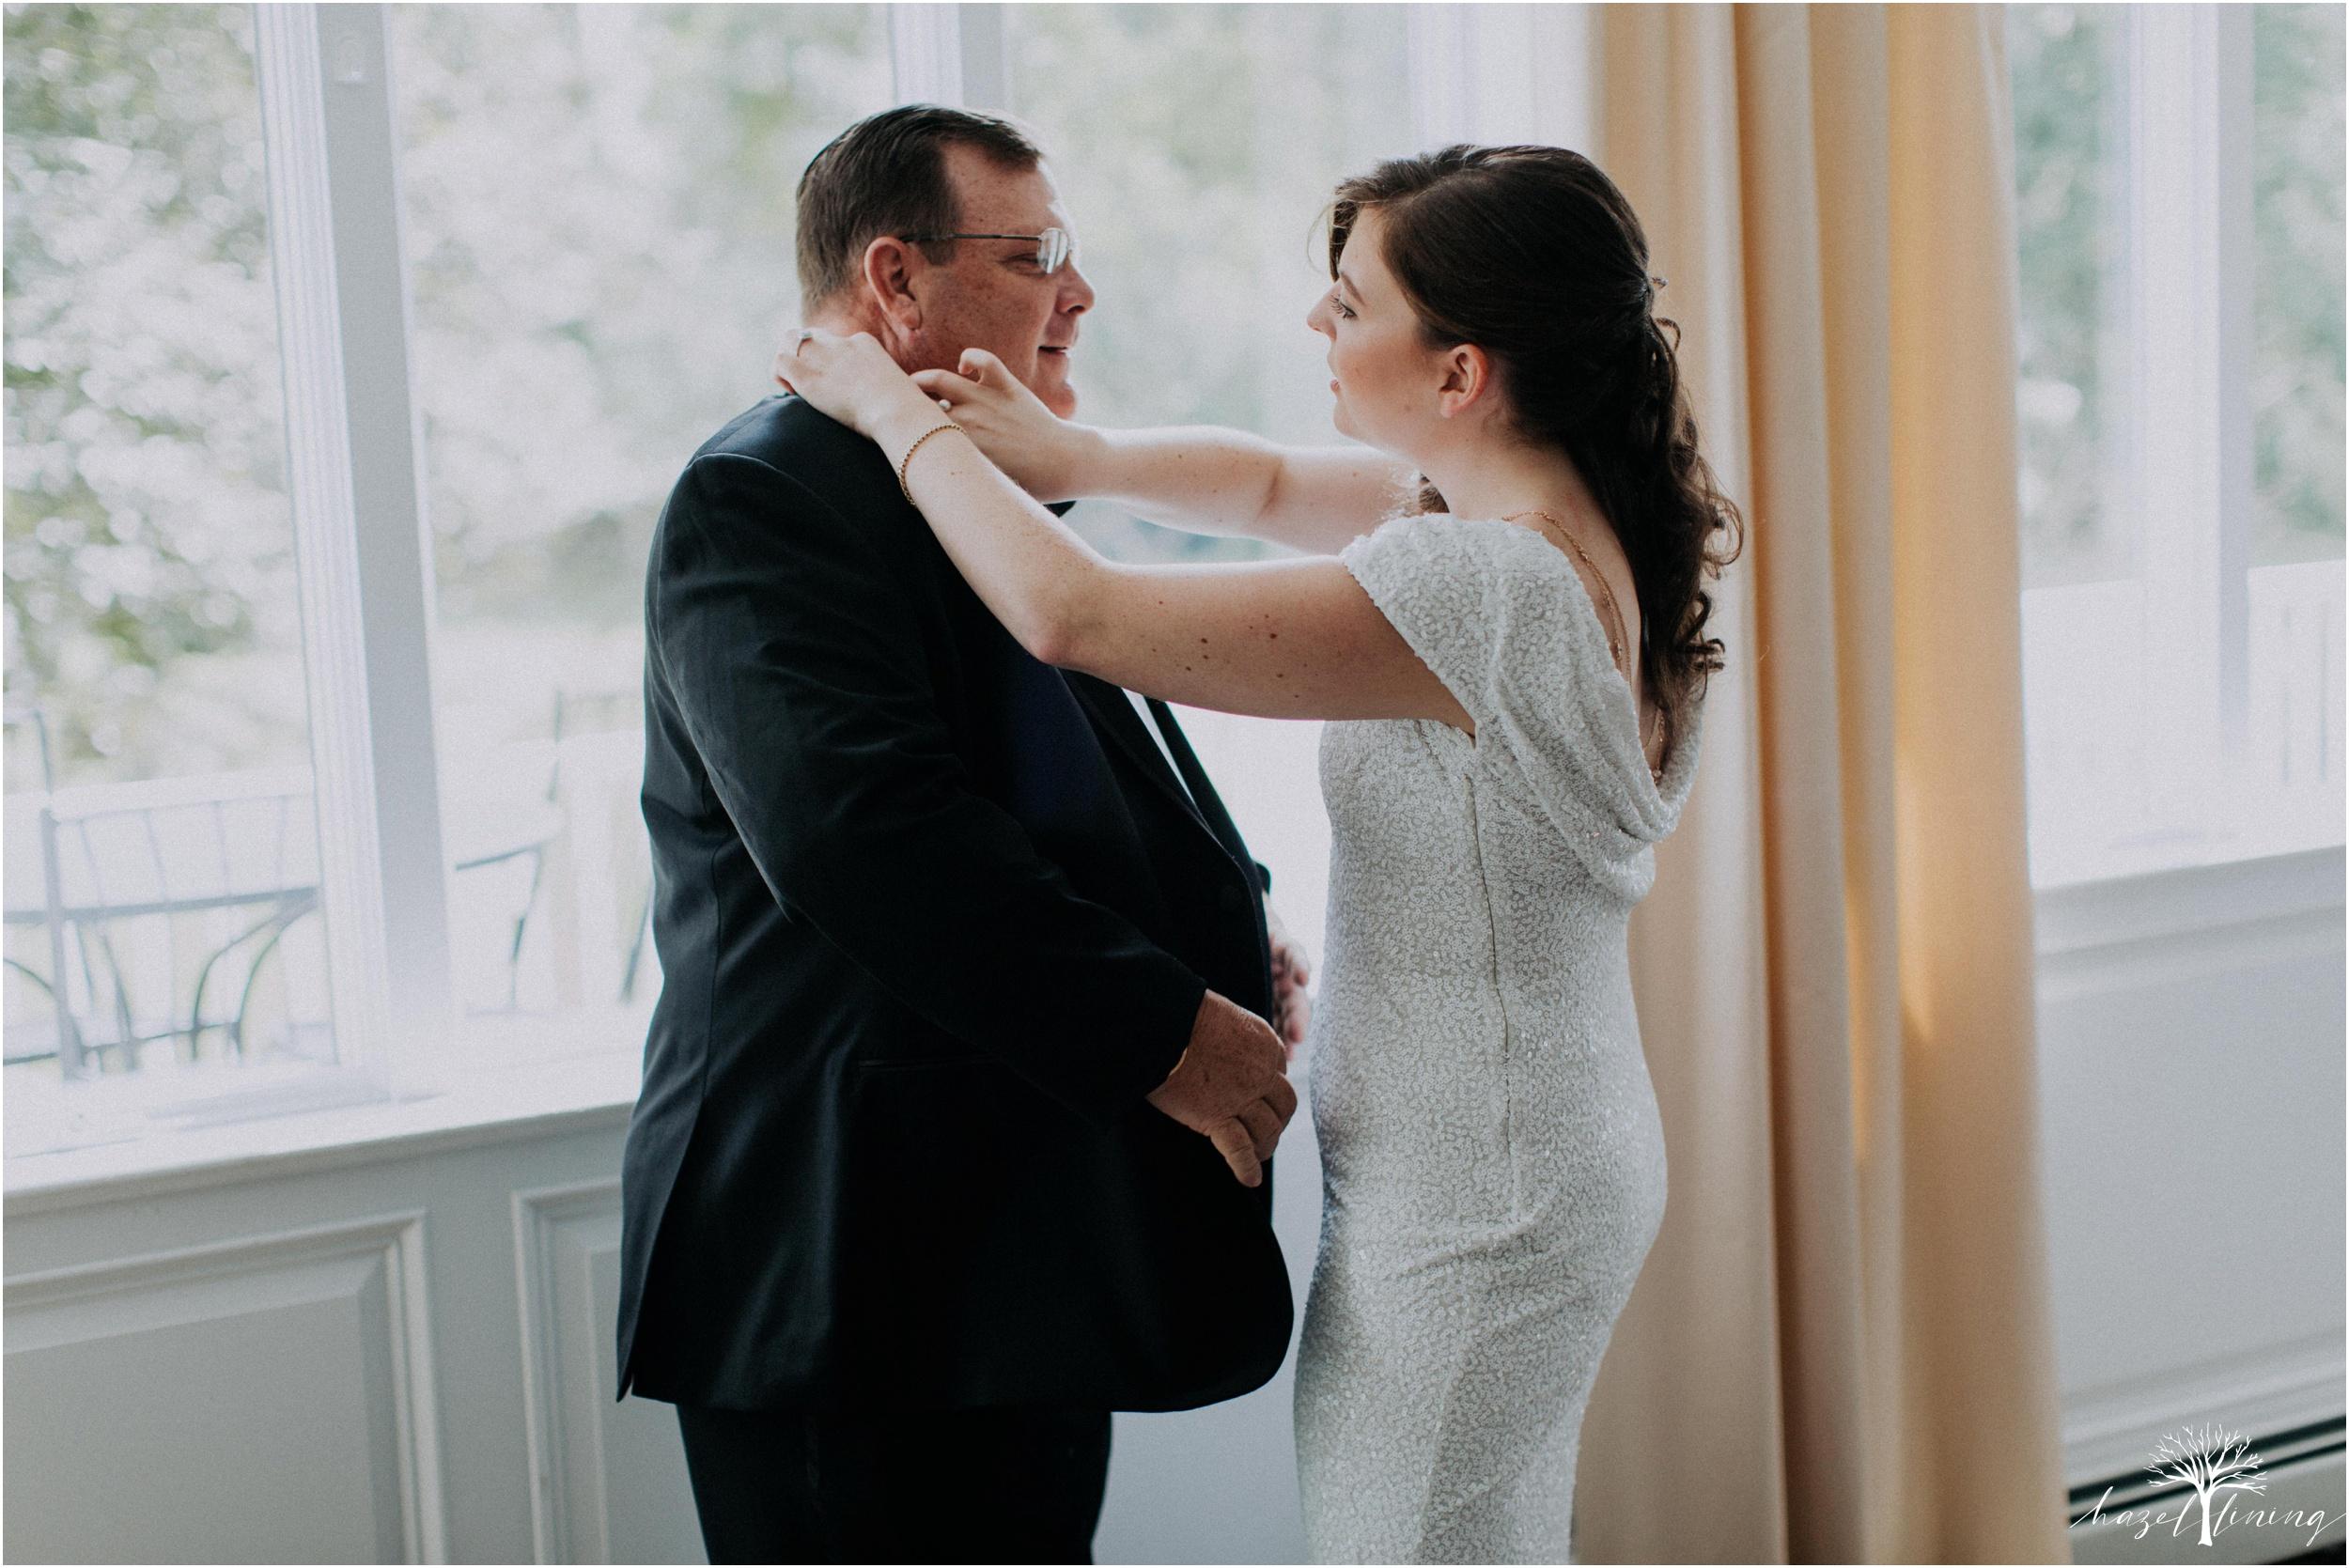 elizabeth-doelp-andrew-foreback-middletown-country-club-summer-langhorne-pennsylvania-wedding-hazel-lining-travel-wedding-elopement-photography_0025.jpg